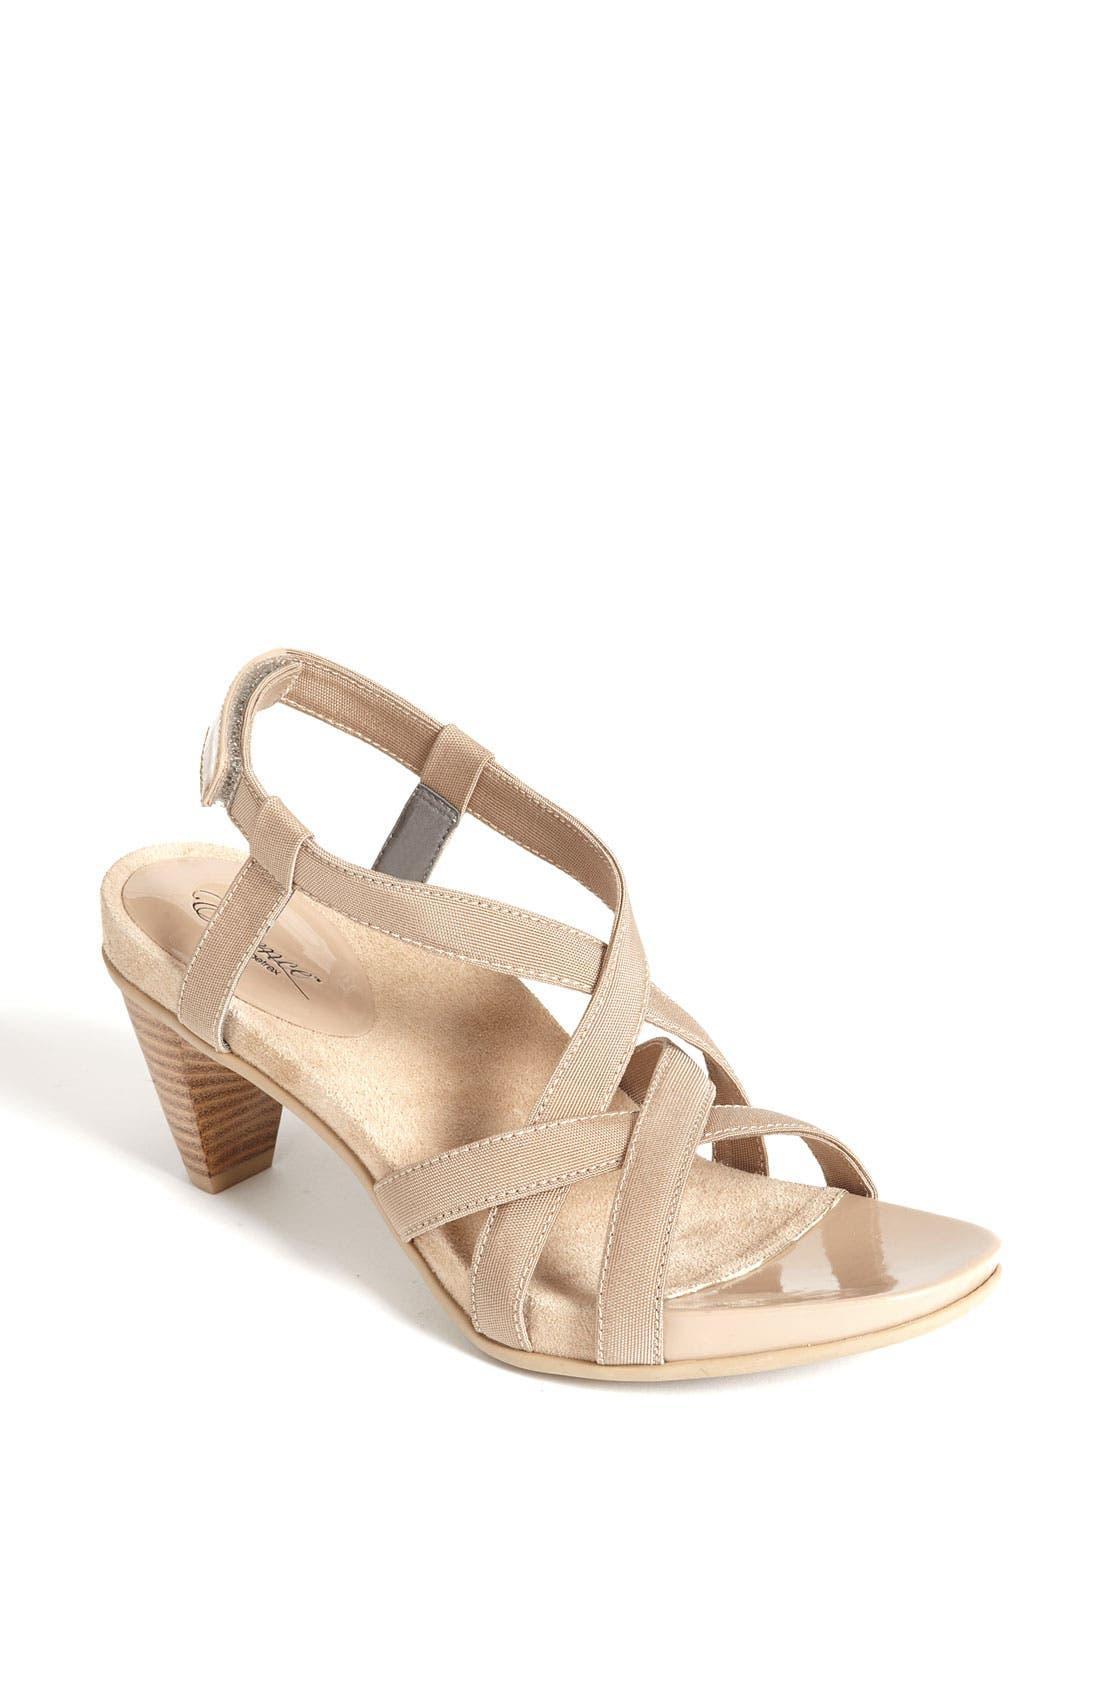 Alternate Image 1 Selected - Aetrex 'Ashley' Sandal